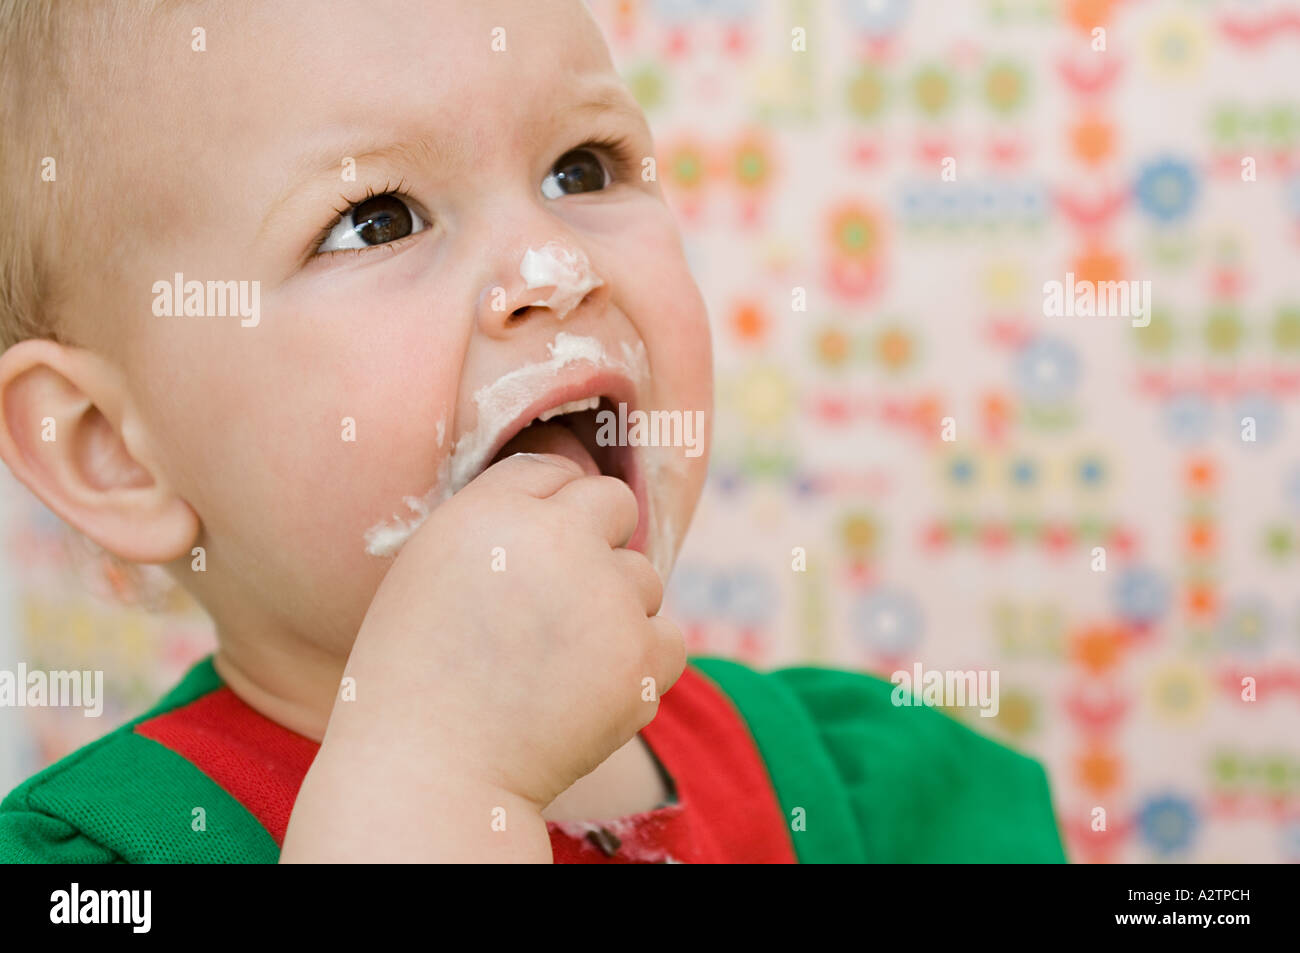 Bébé avec un visage malpropre Photo Stock